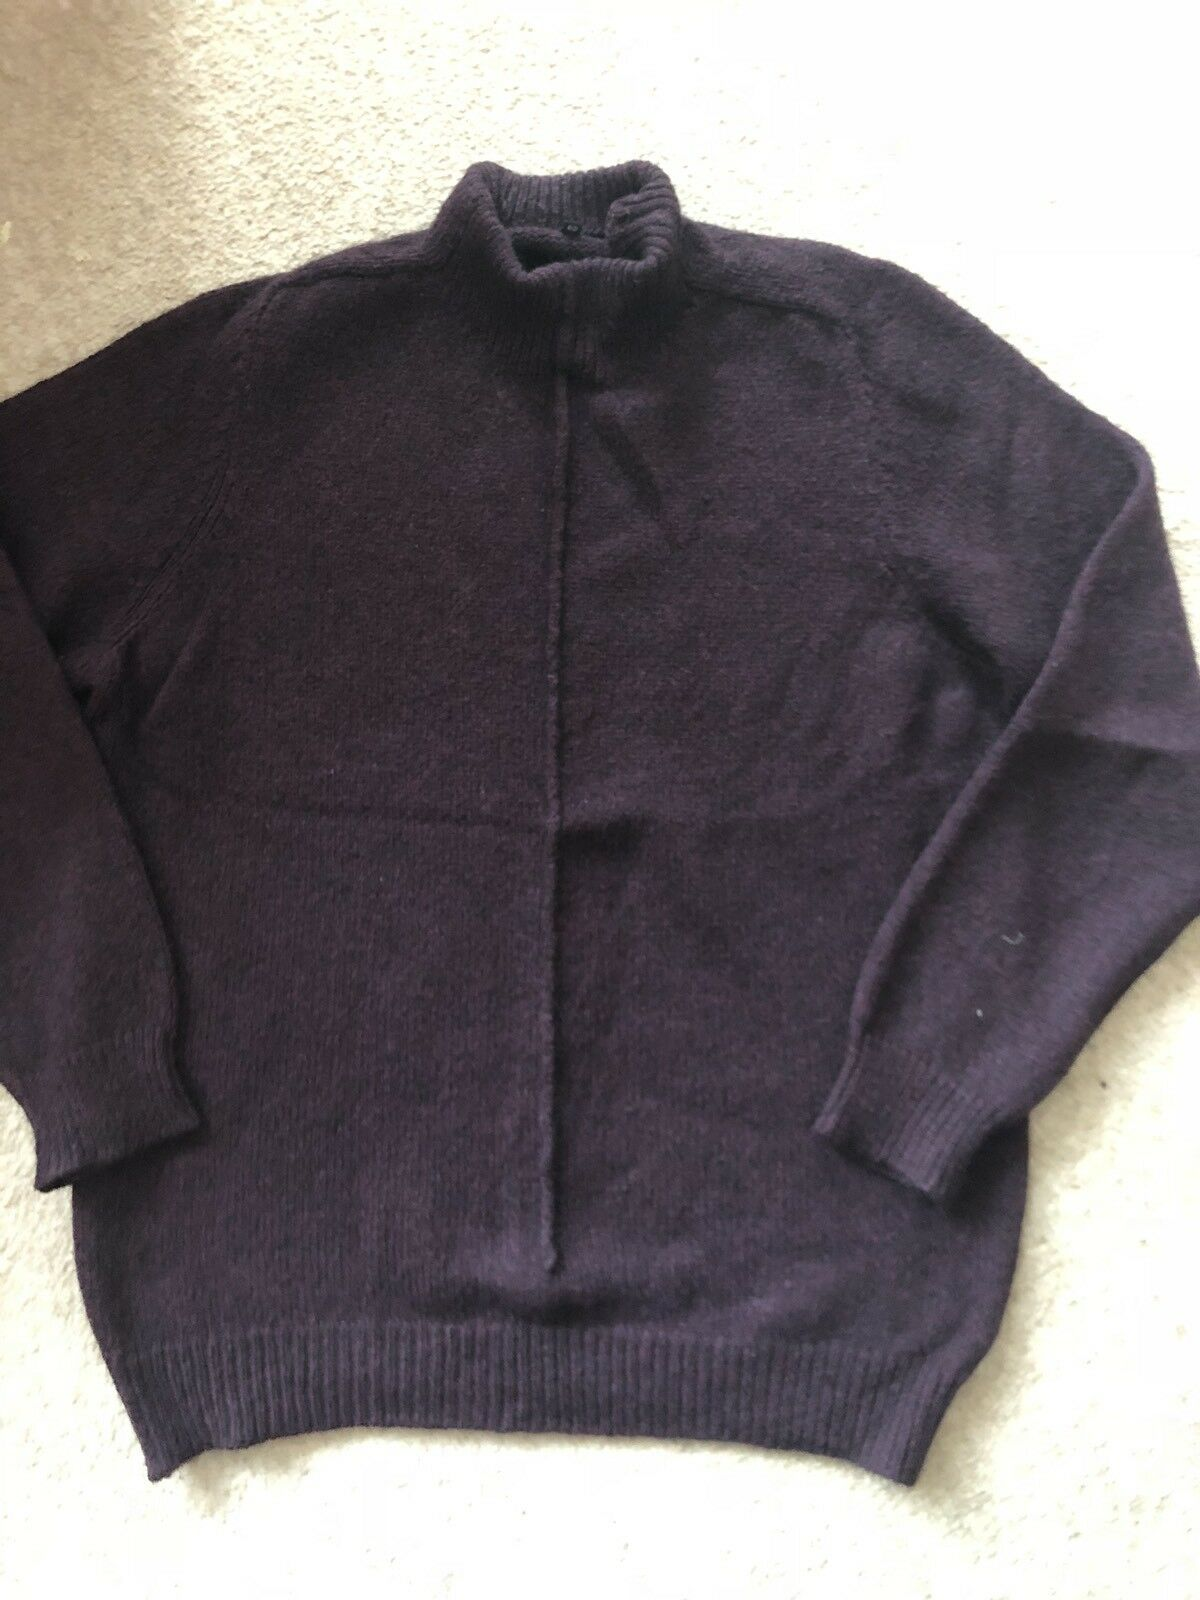 Men's Virgin Wool And Alpaca Jumper, Size 50, Purple Colour, Used